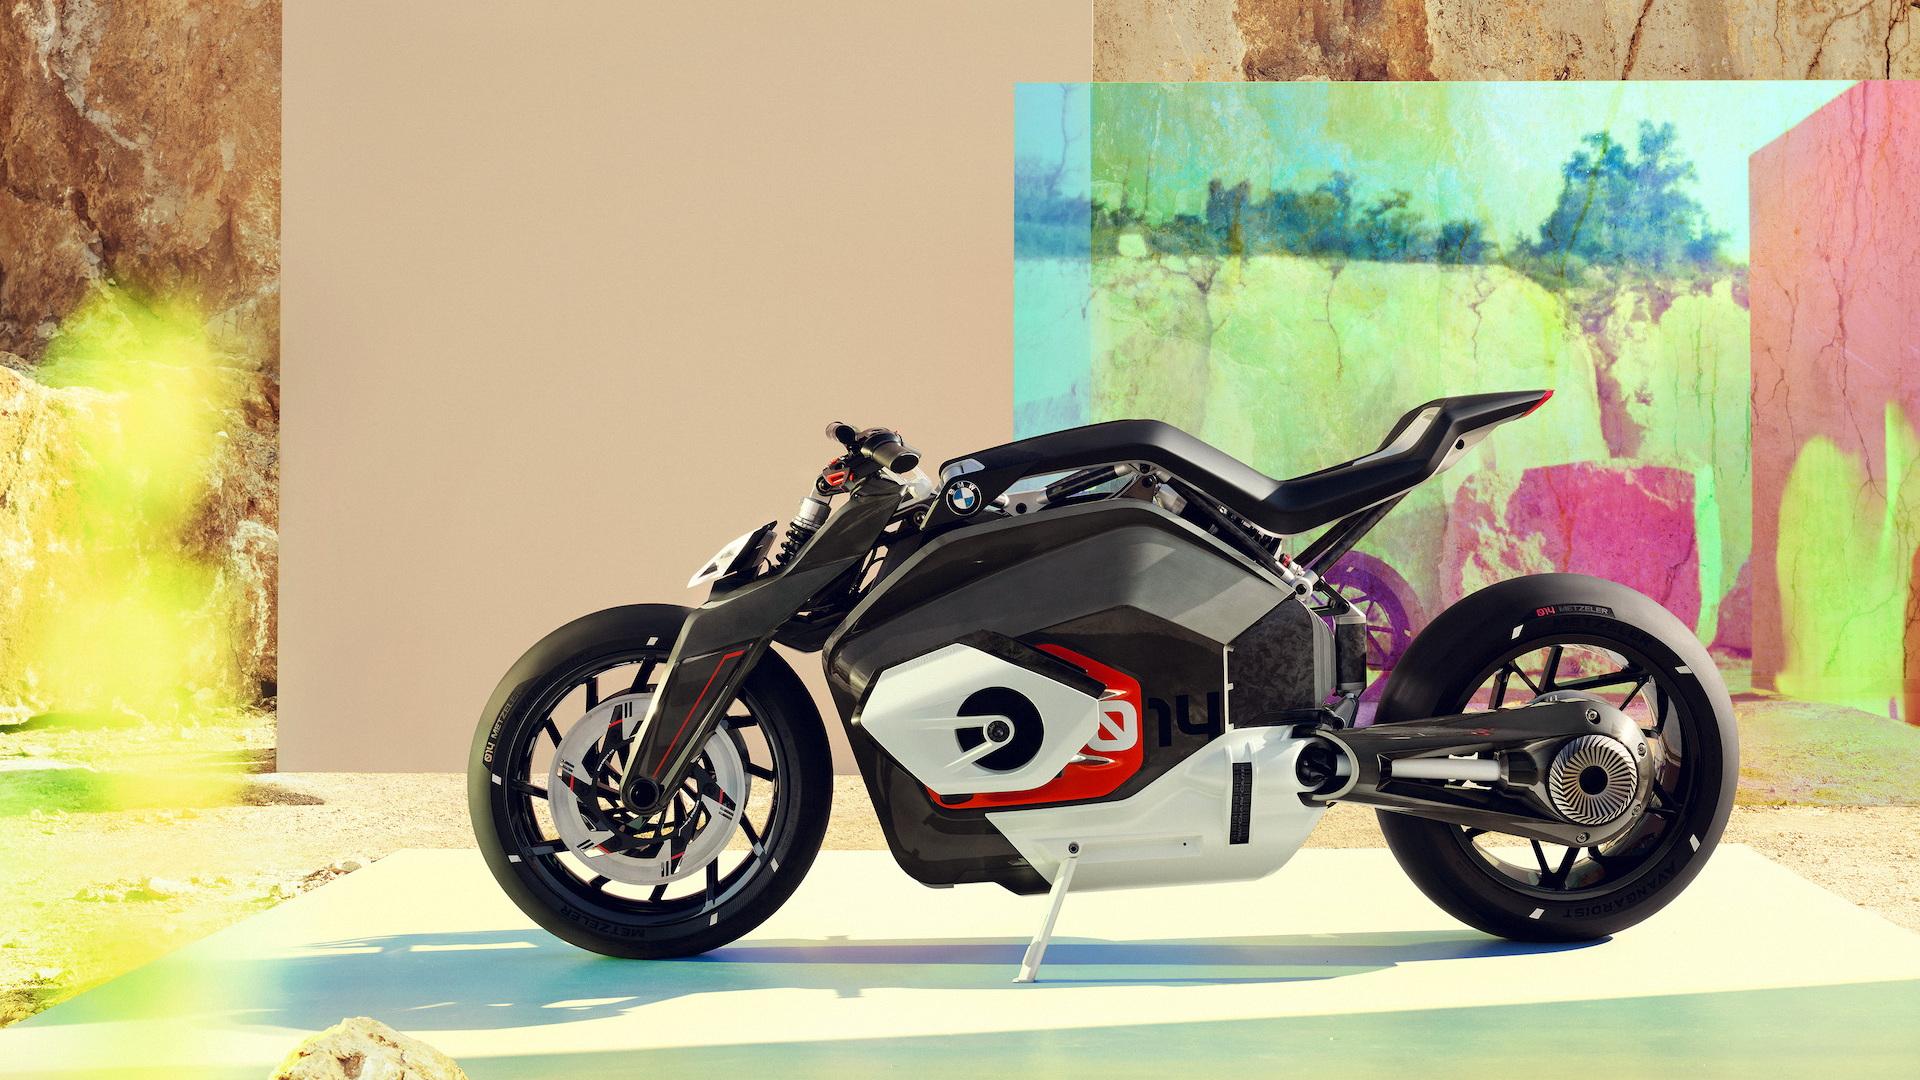 BMW Motorrad Vision DC electric motorcycle concept